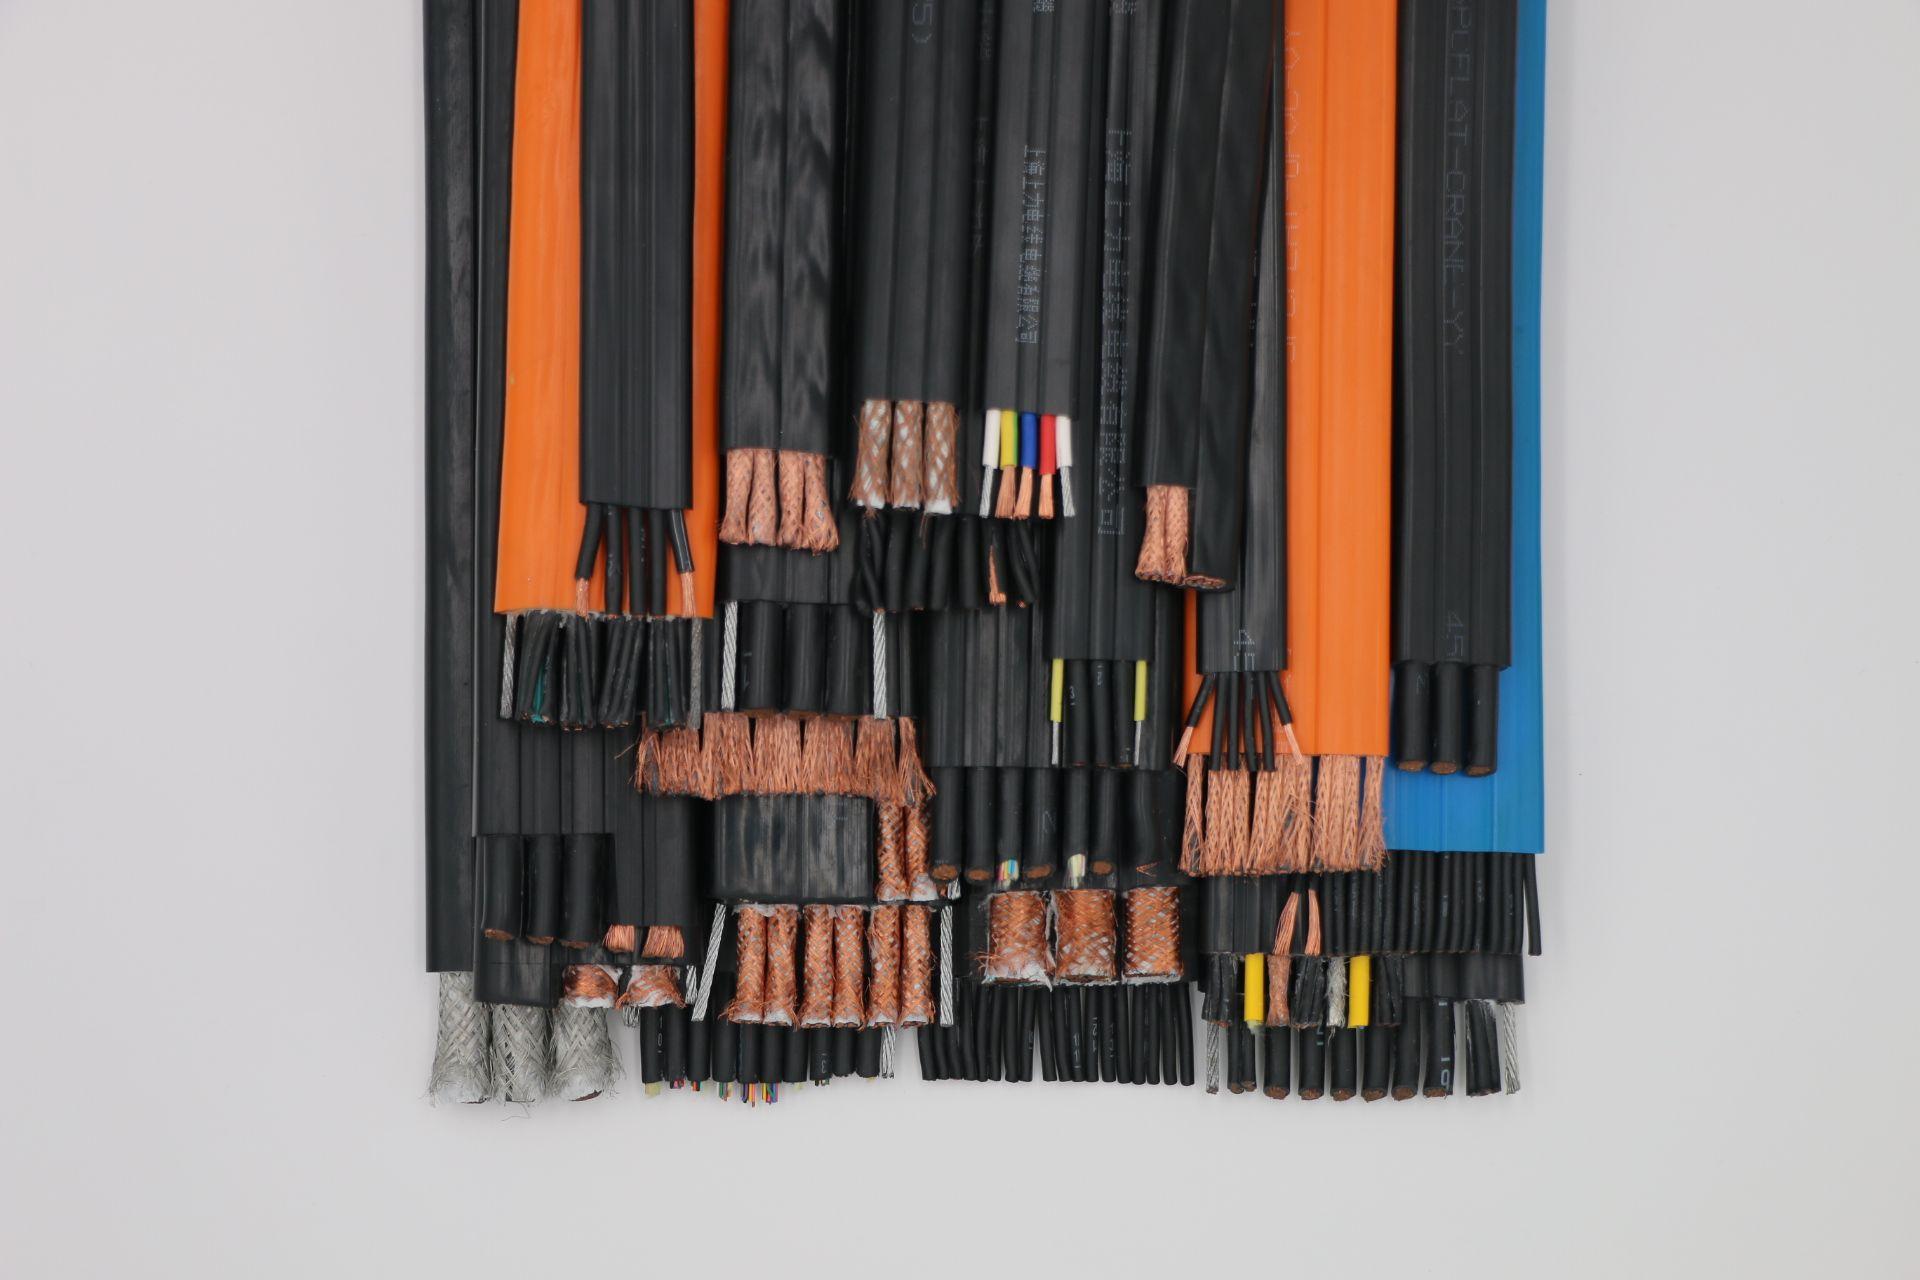 YFFB行车扁电缆  SPCFLAT-CRANE-YY行车扁电缆